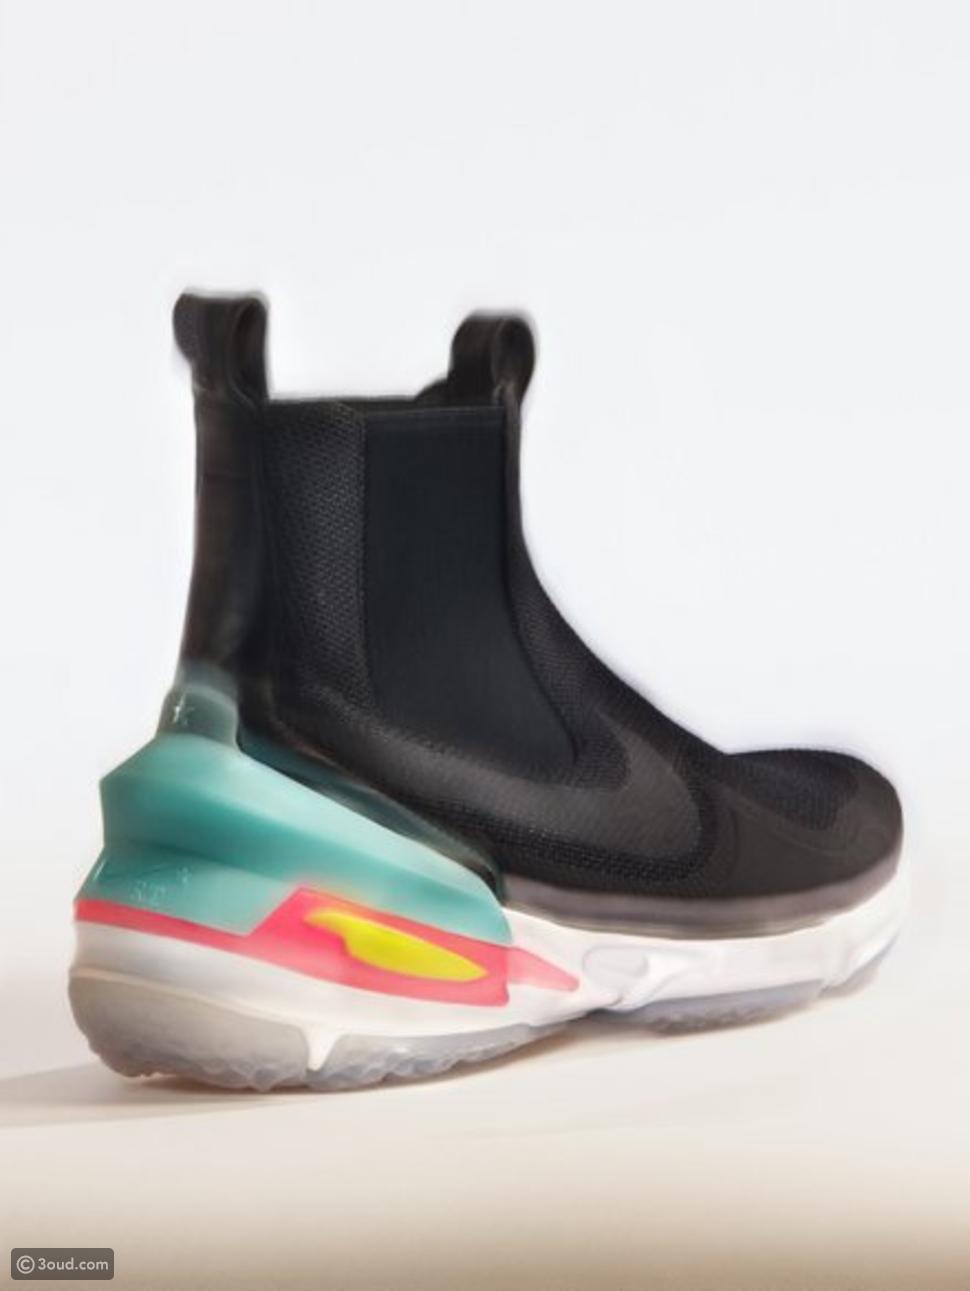 المصمم Riccardo Tisci يتعاون مع Nike